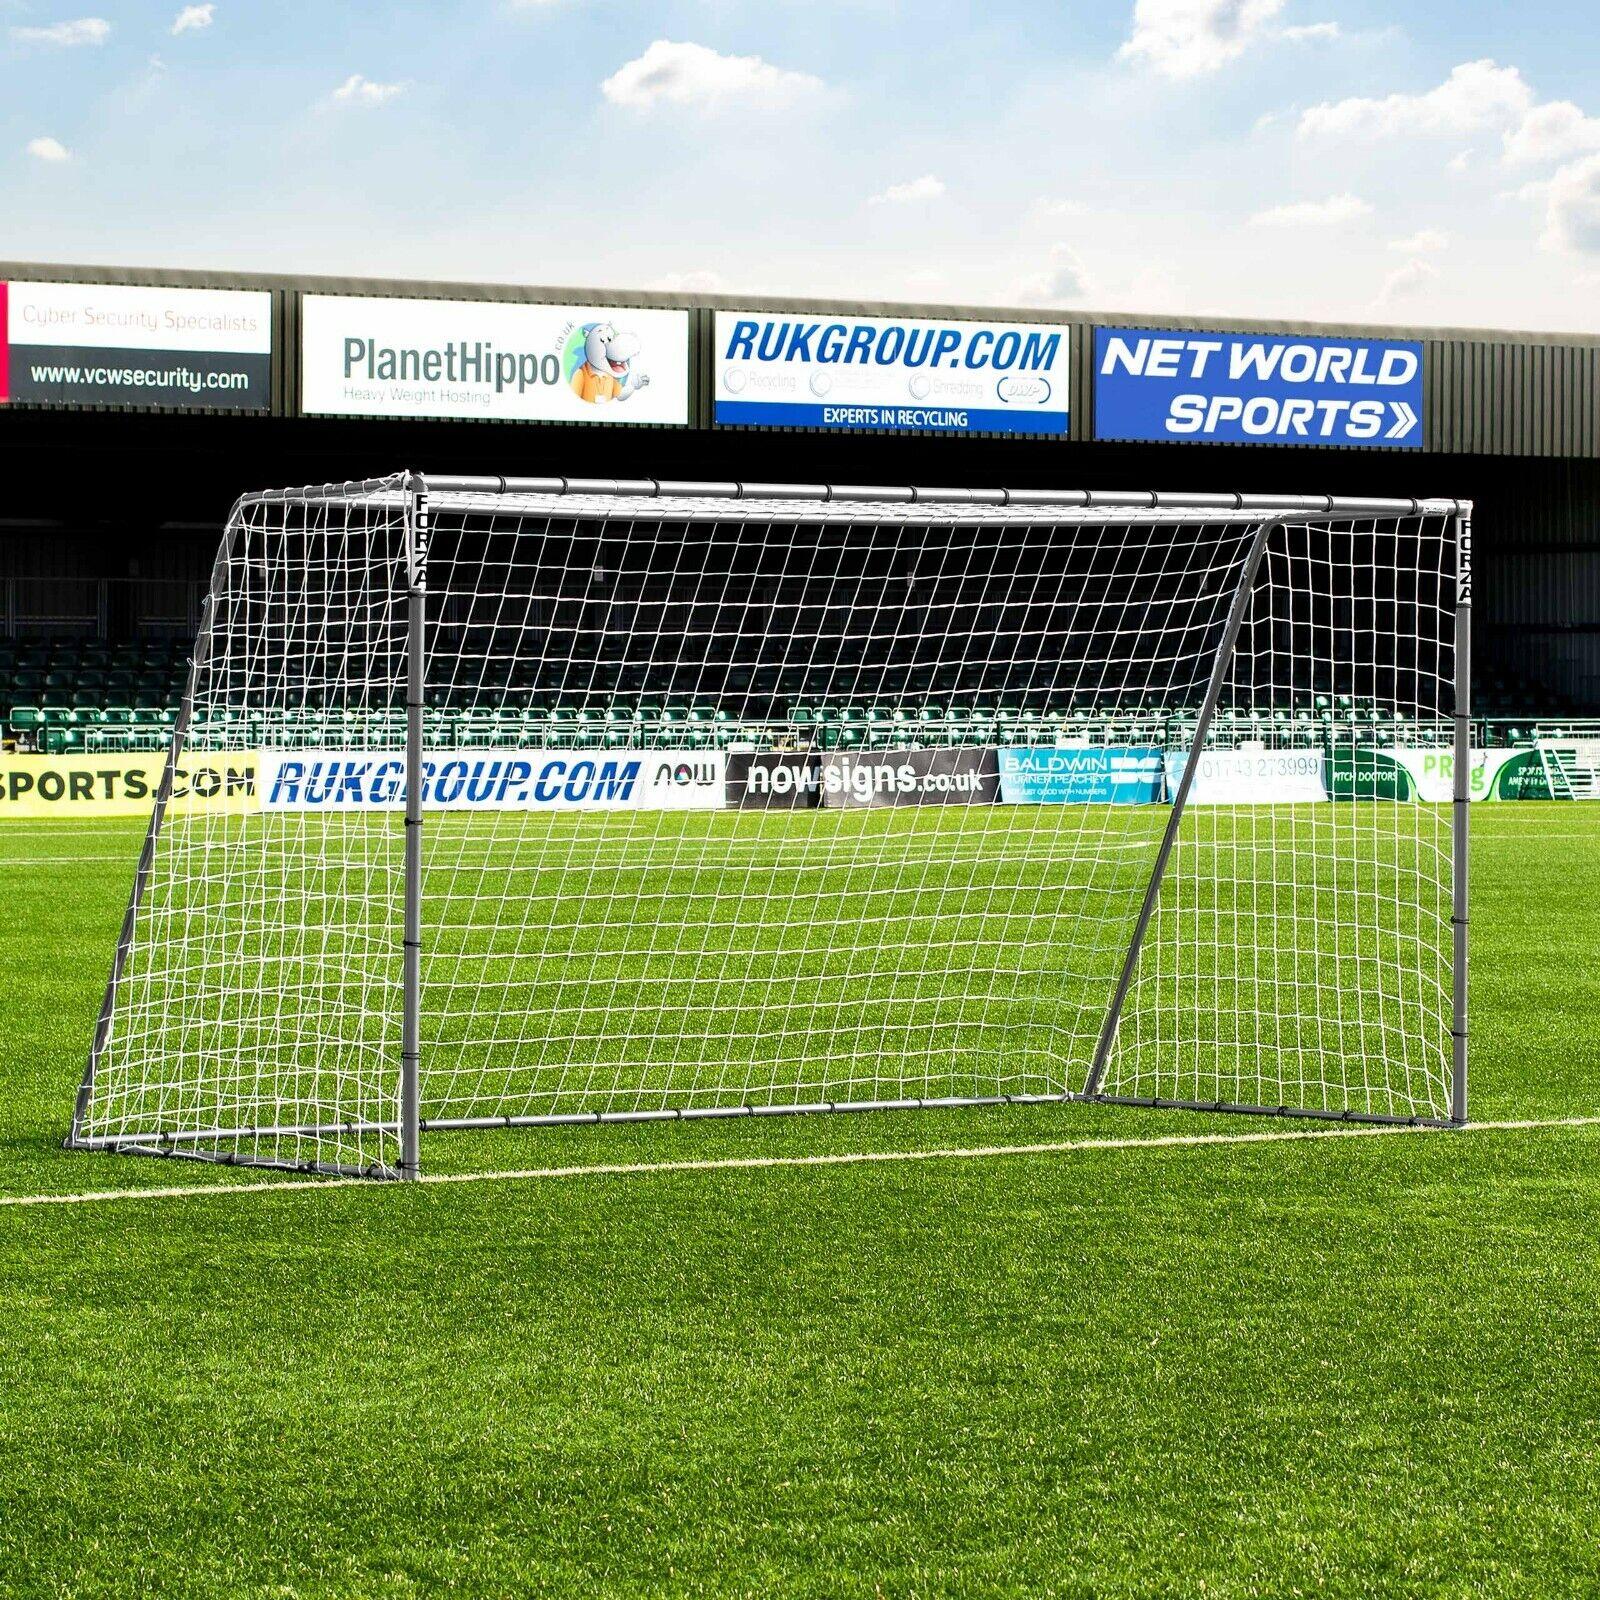 Forza Acero 42 objetivo de fútbol   12 ft (approx. 3.66 m) X 6 ft (approx. 1.83 m)   fuerte Junior meta   Acero Niños meta